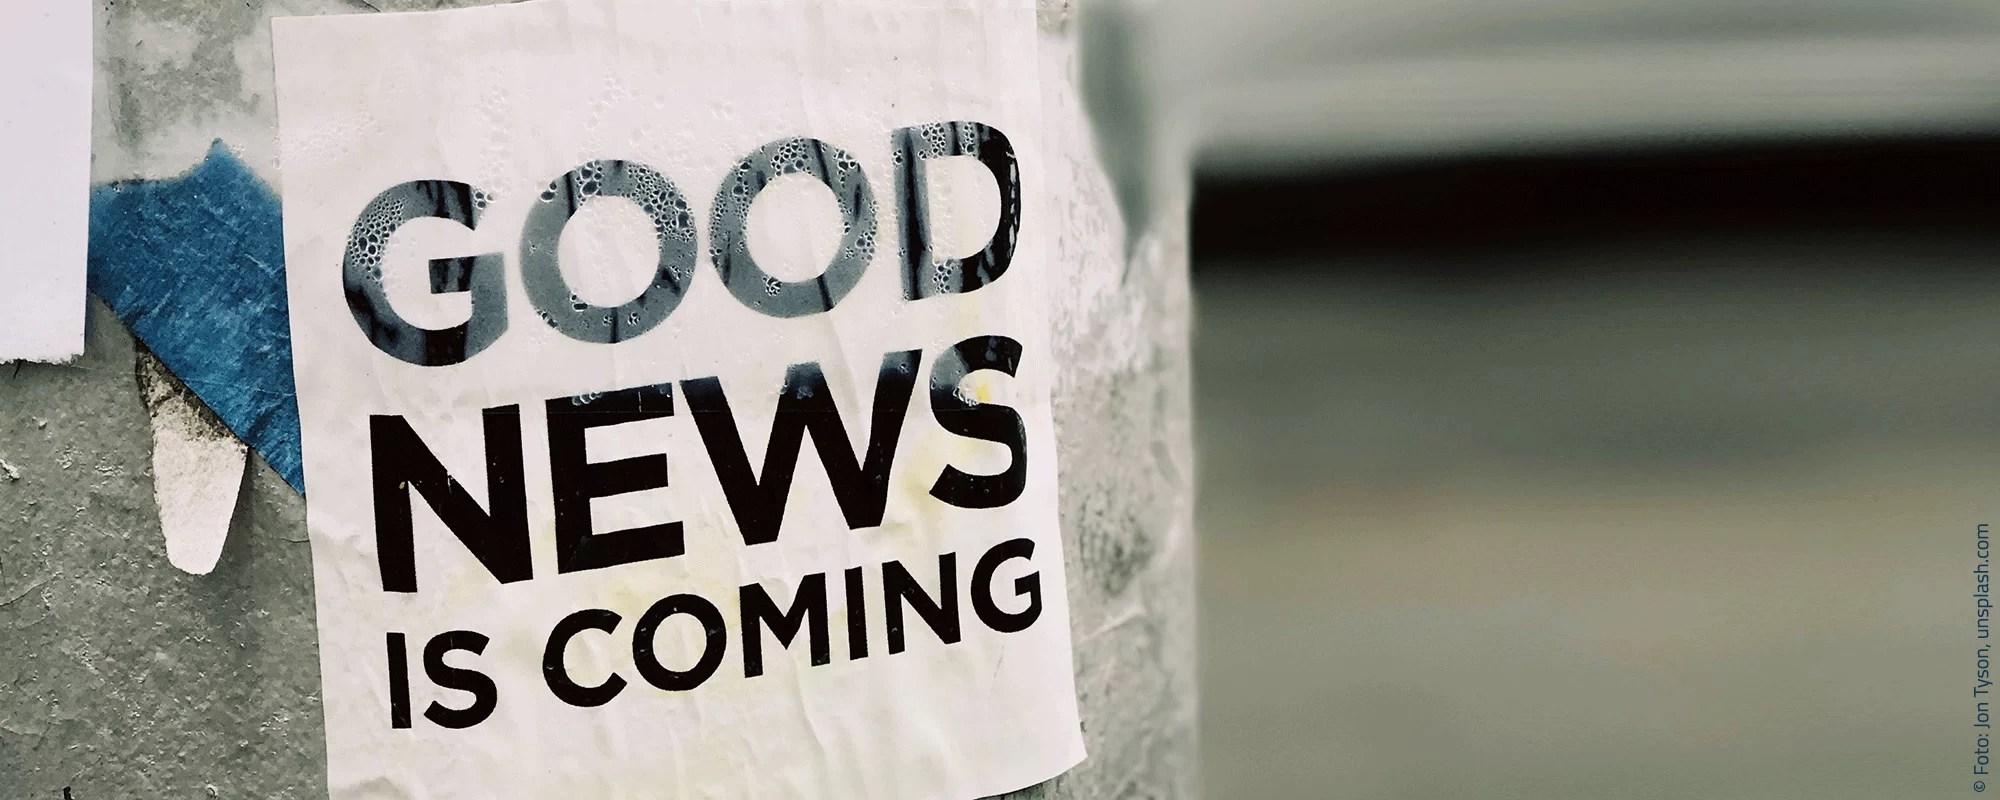 170522 hp good - Good News